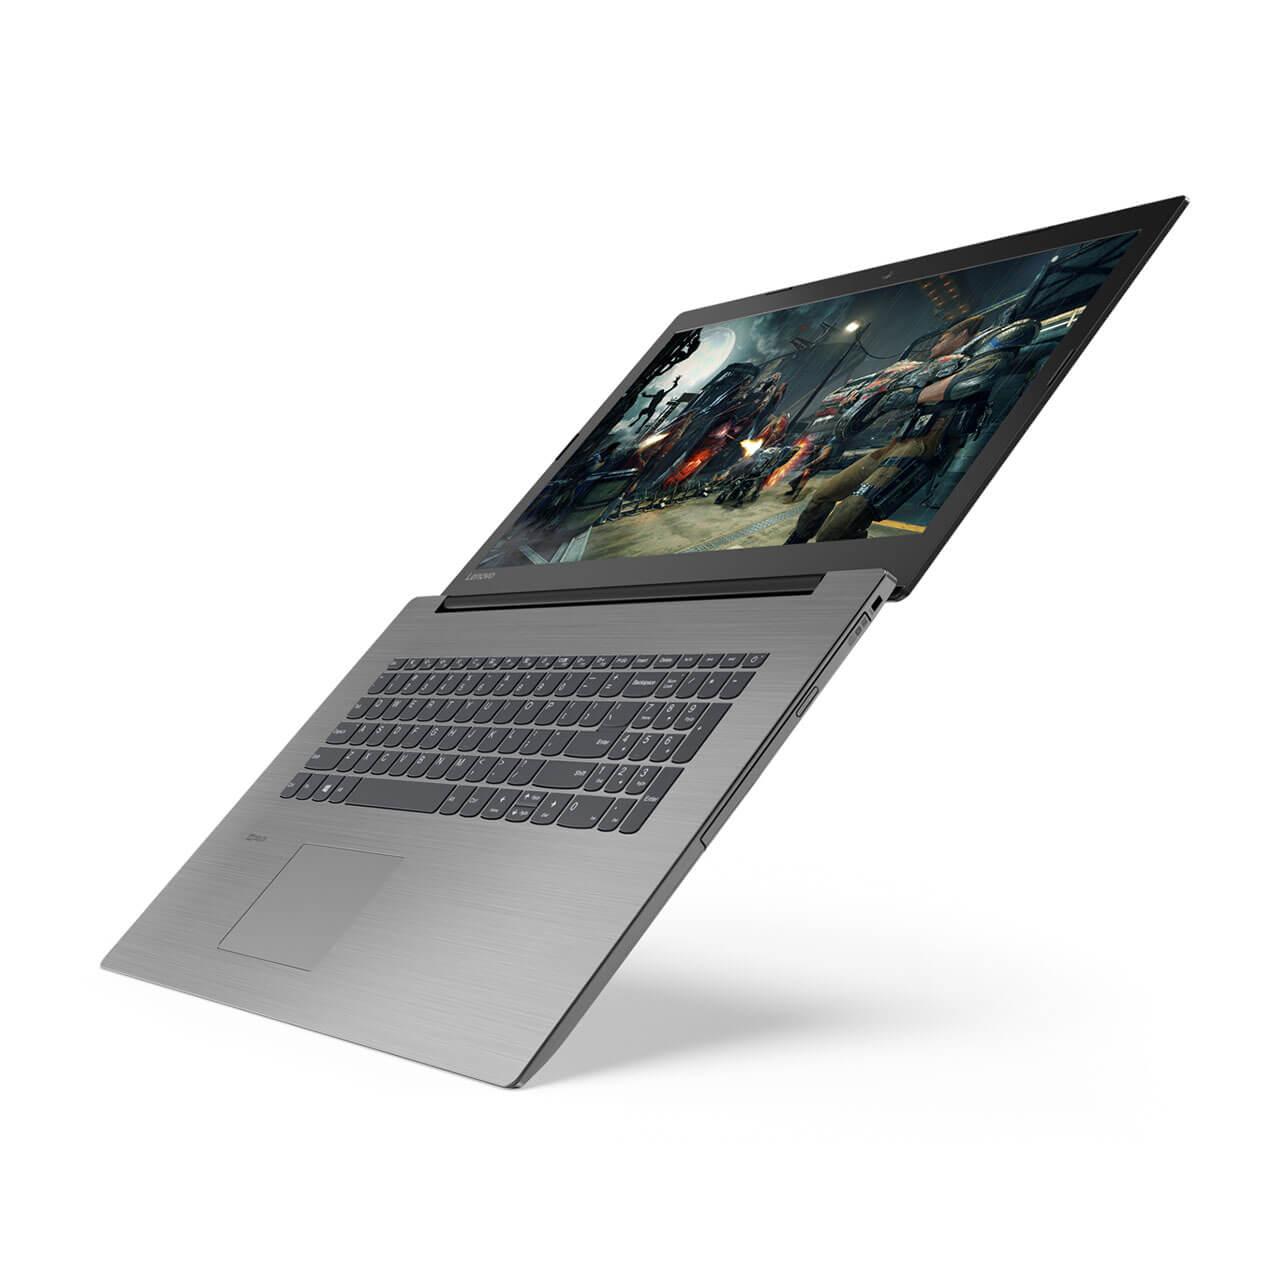 "Lenovo Ideapad 330, 17.3"", i5-8250U, 12 GB RAM, 2TB 5400 RPM, Win 10 Home 64 4"